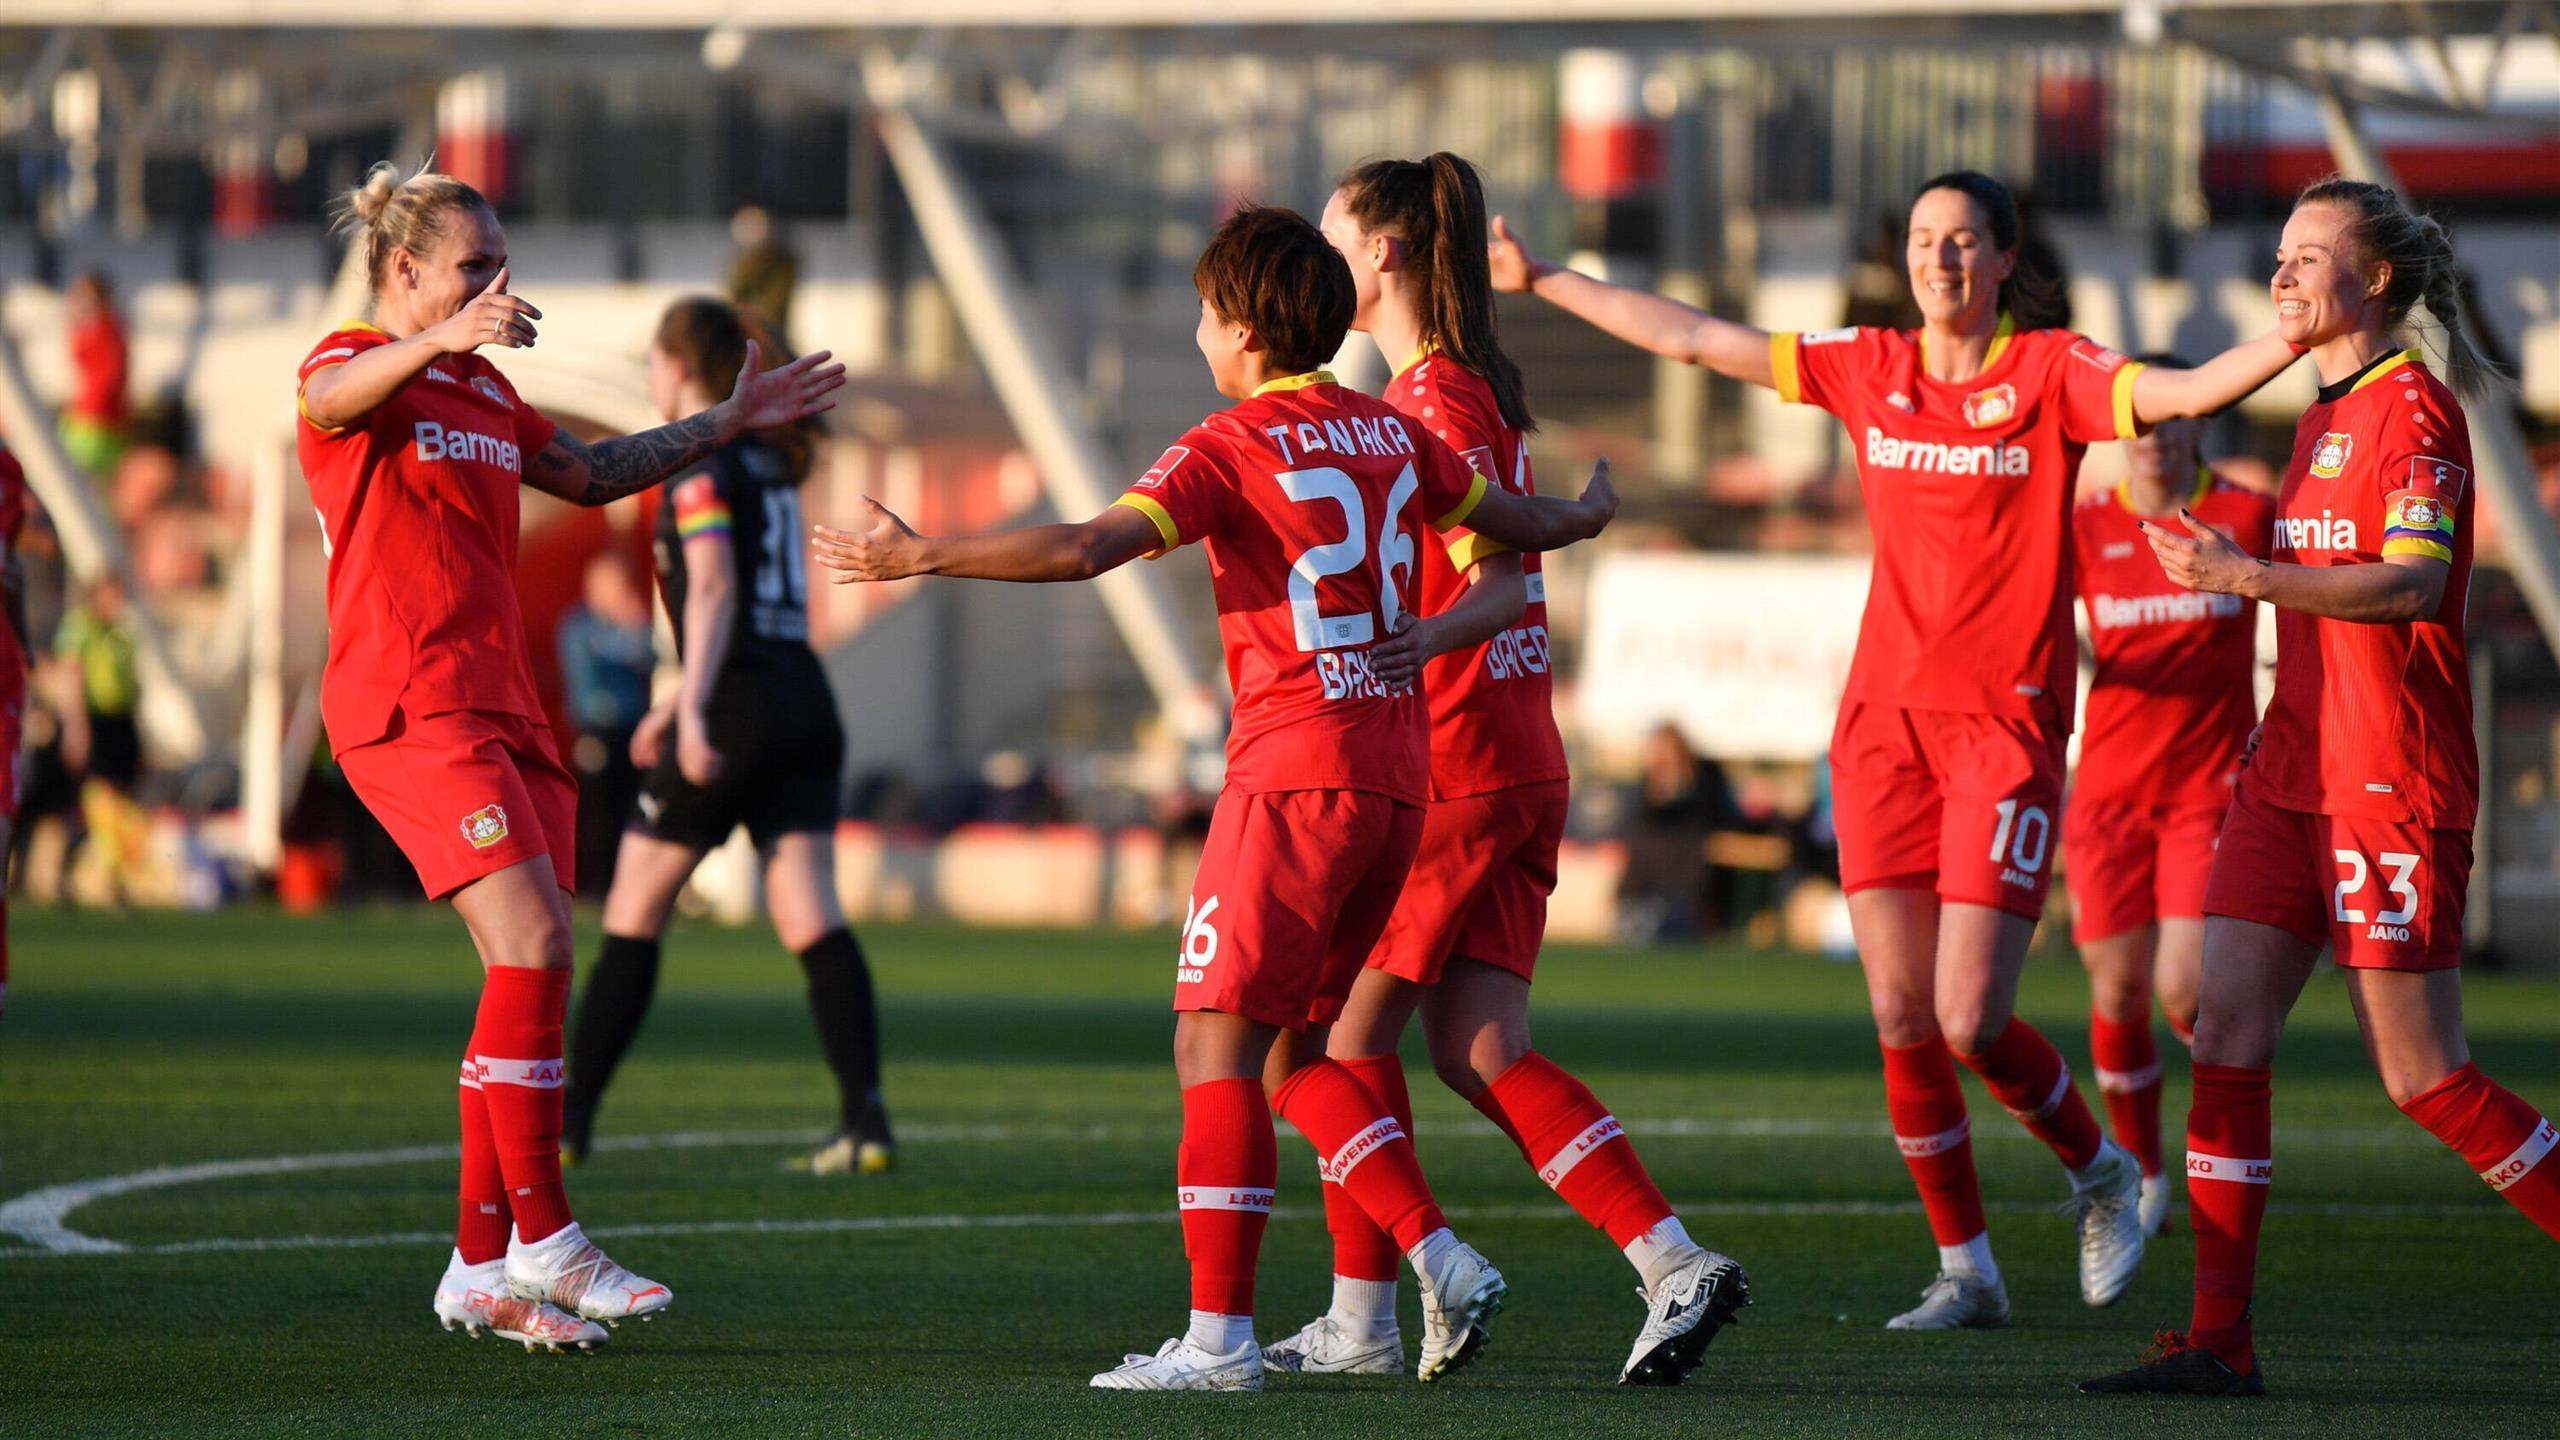 Flyeralarm Frauen Bundesliga Fussball News Ergebnisse Eurosport